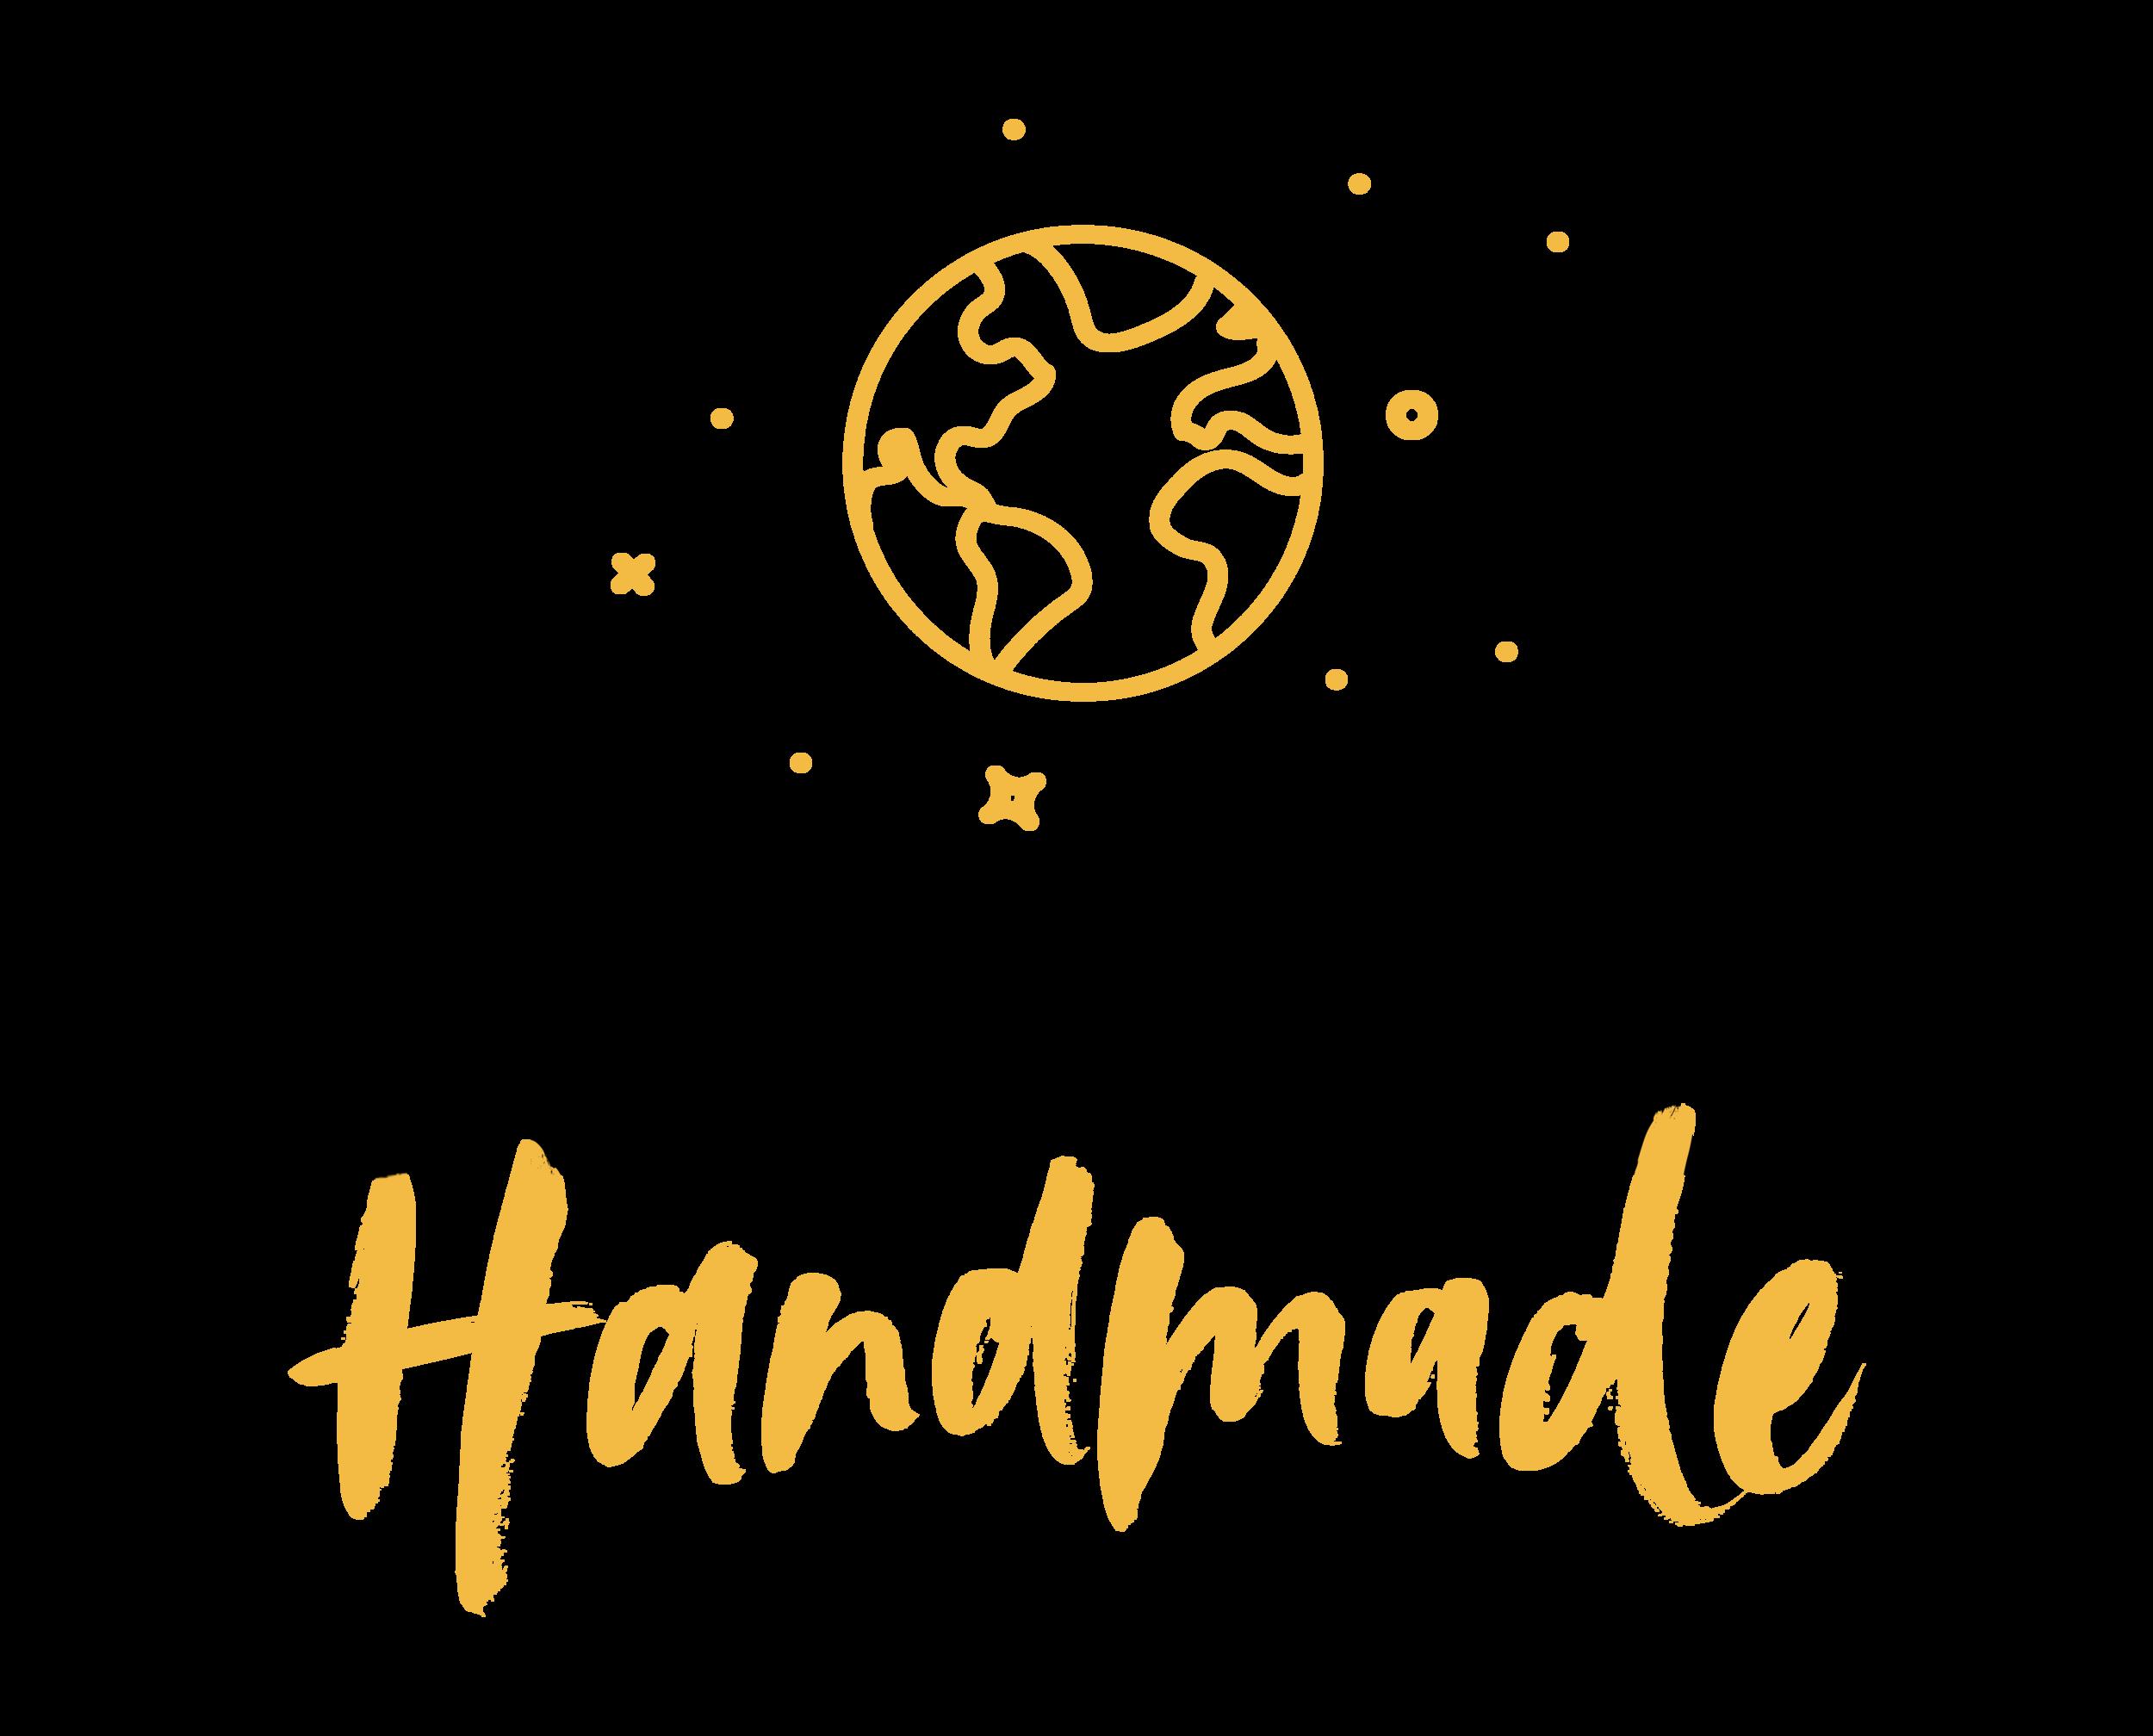 Handmade_vertical.png